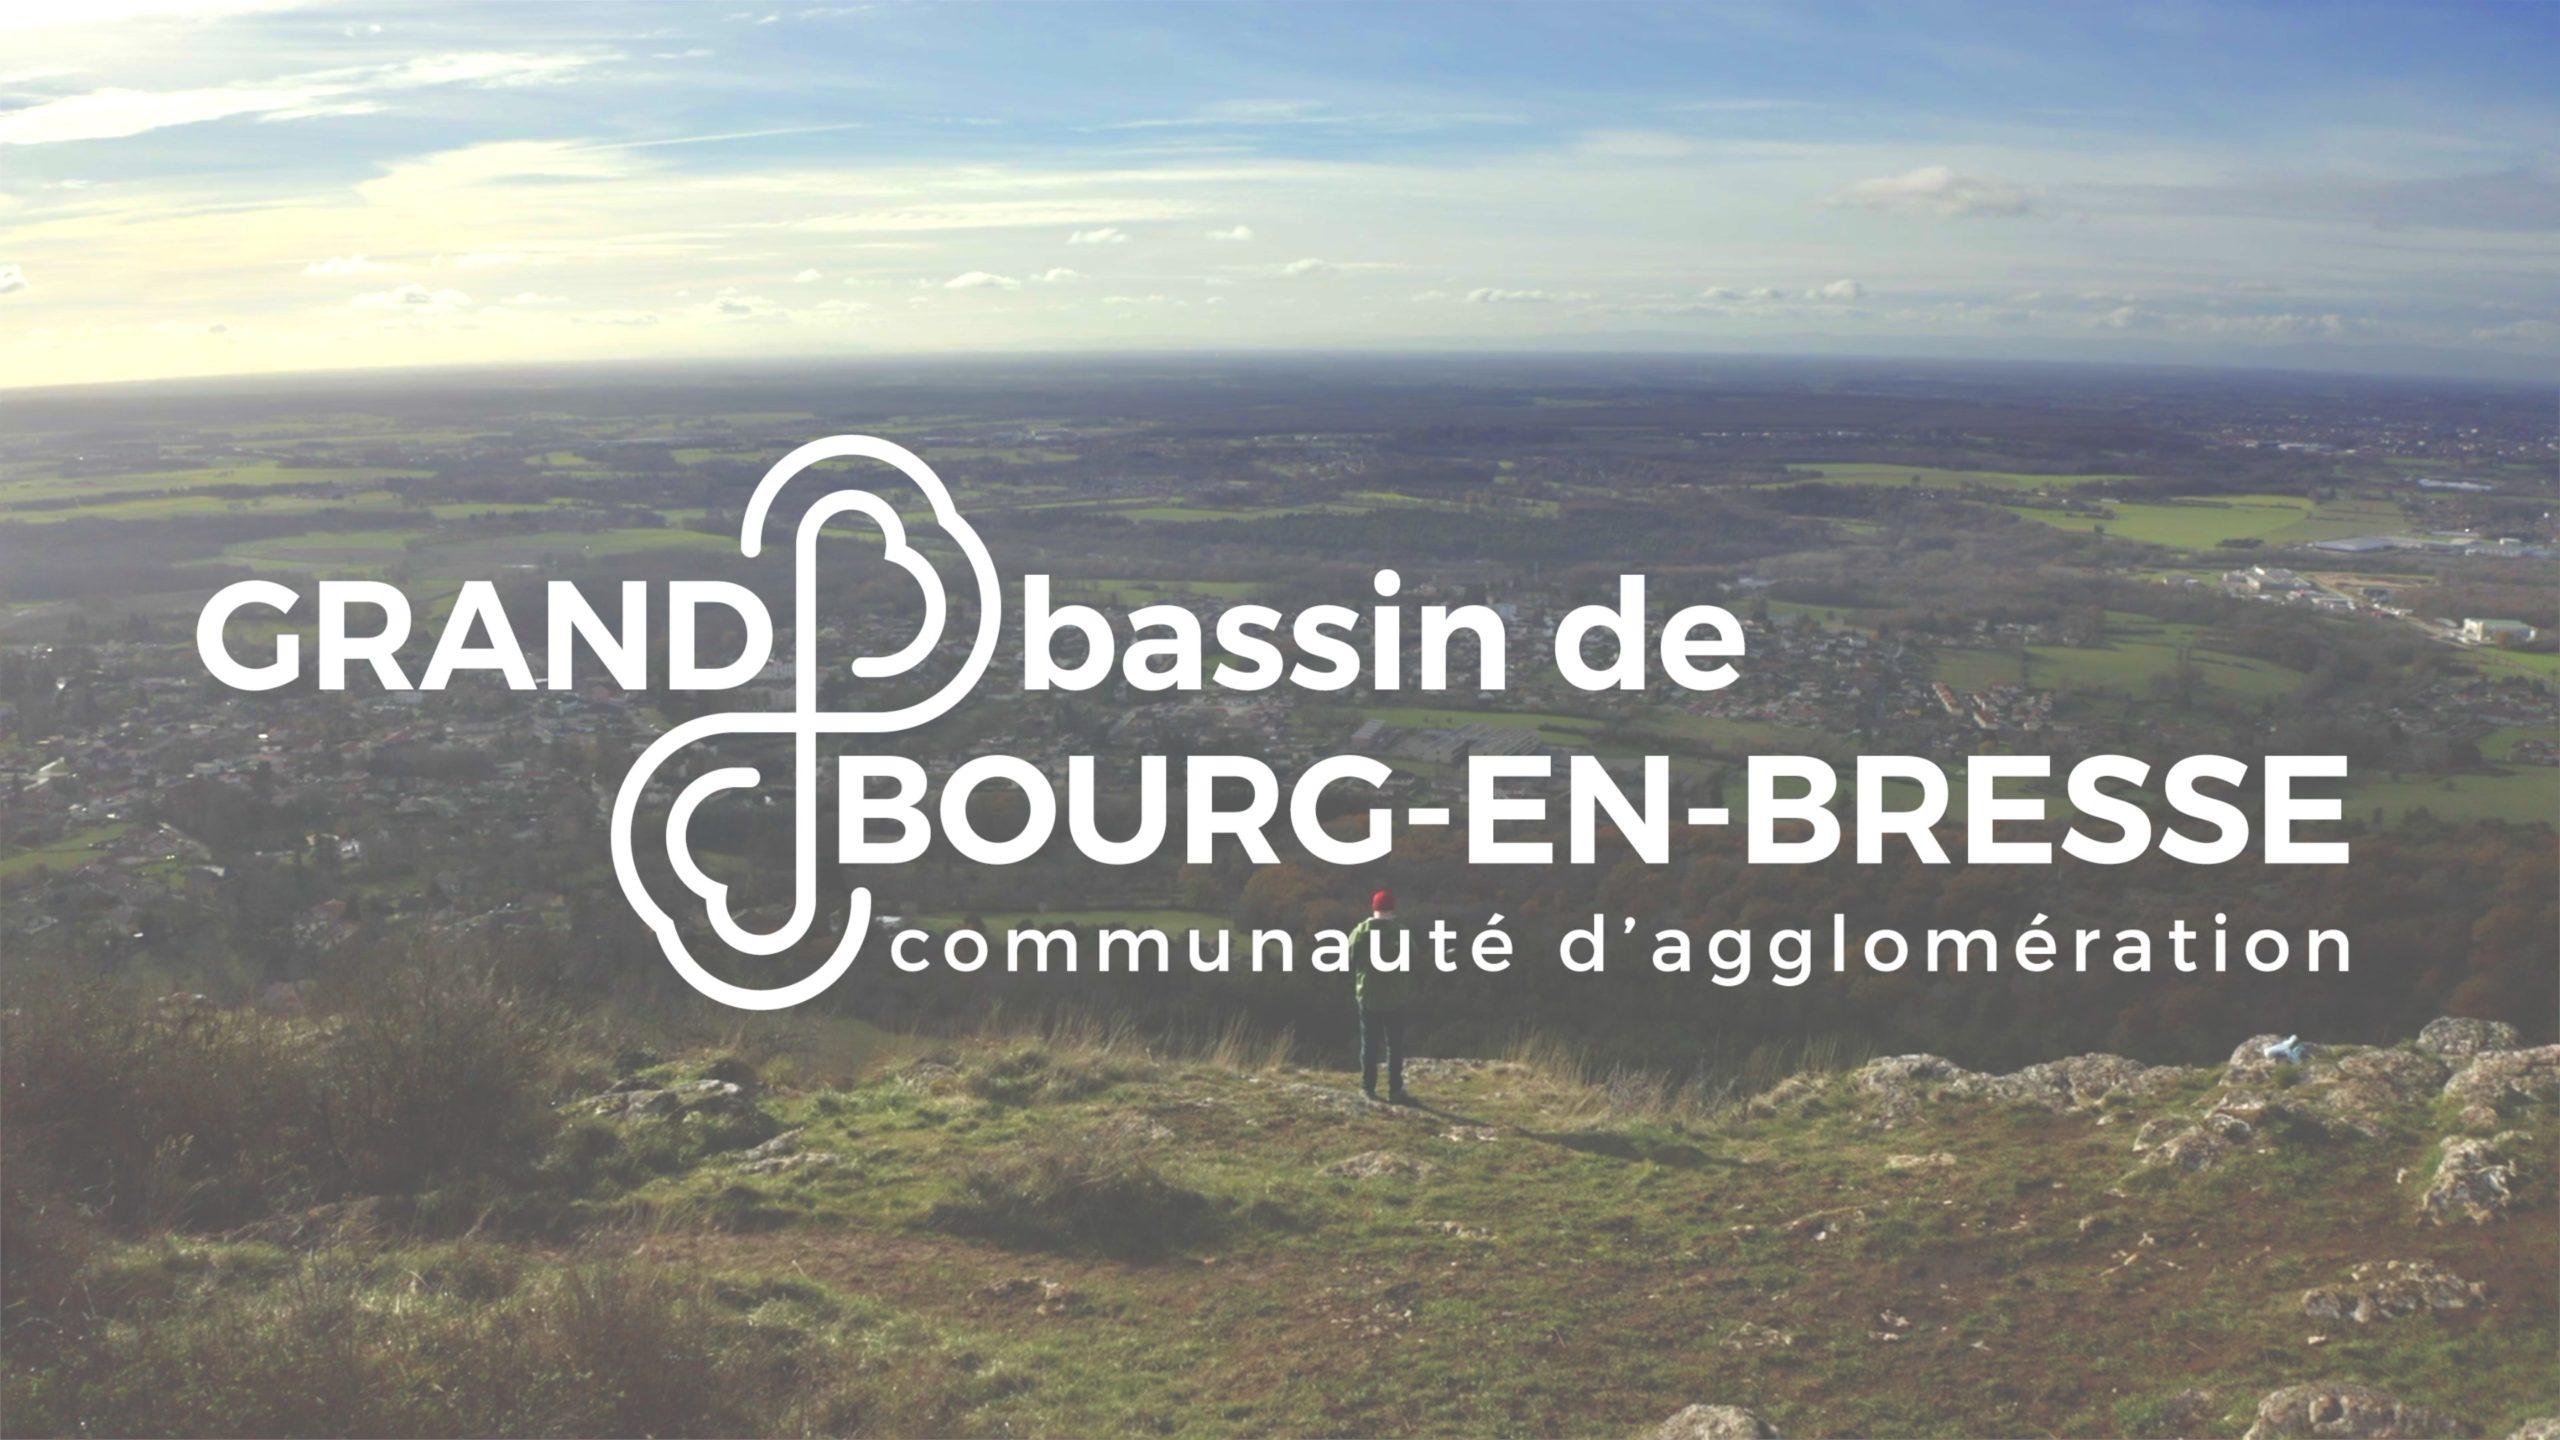 realisation video ca3B bourg-en-bresse